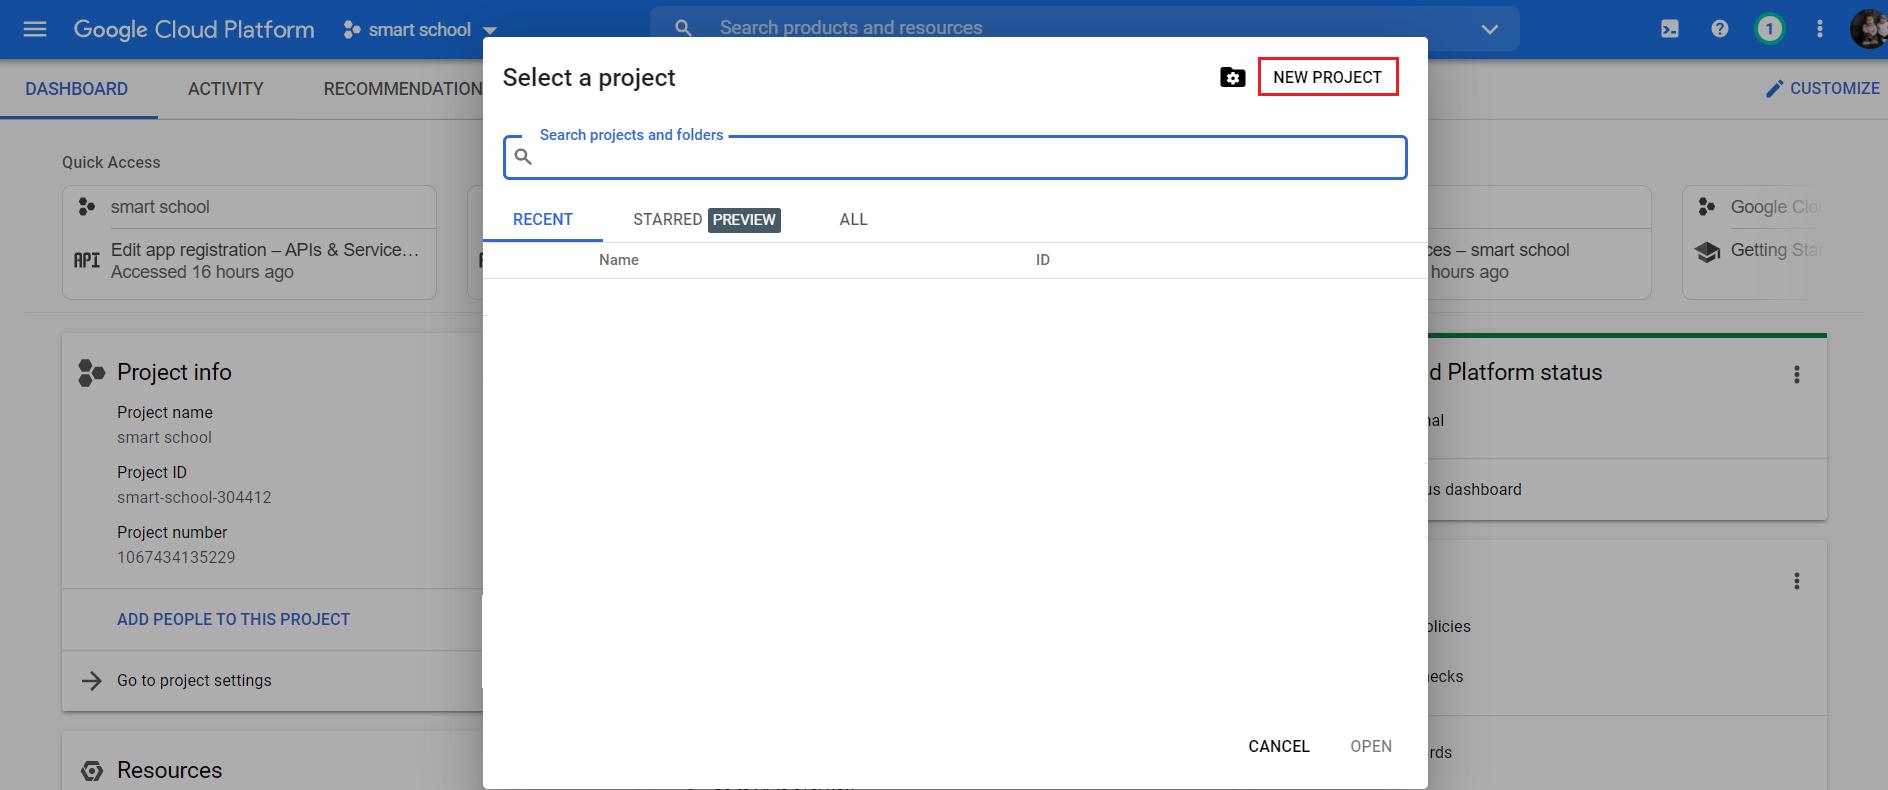 Gmeet create new project